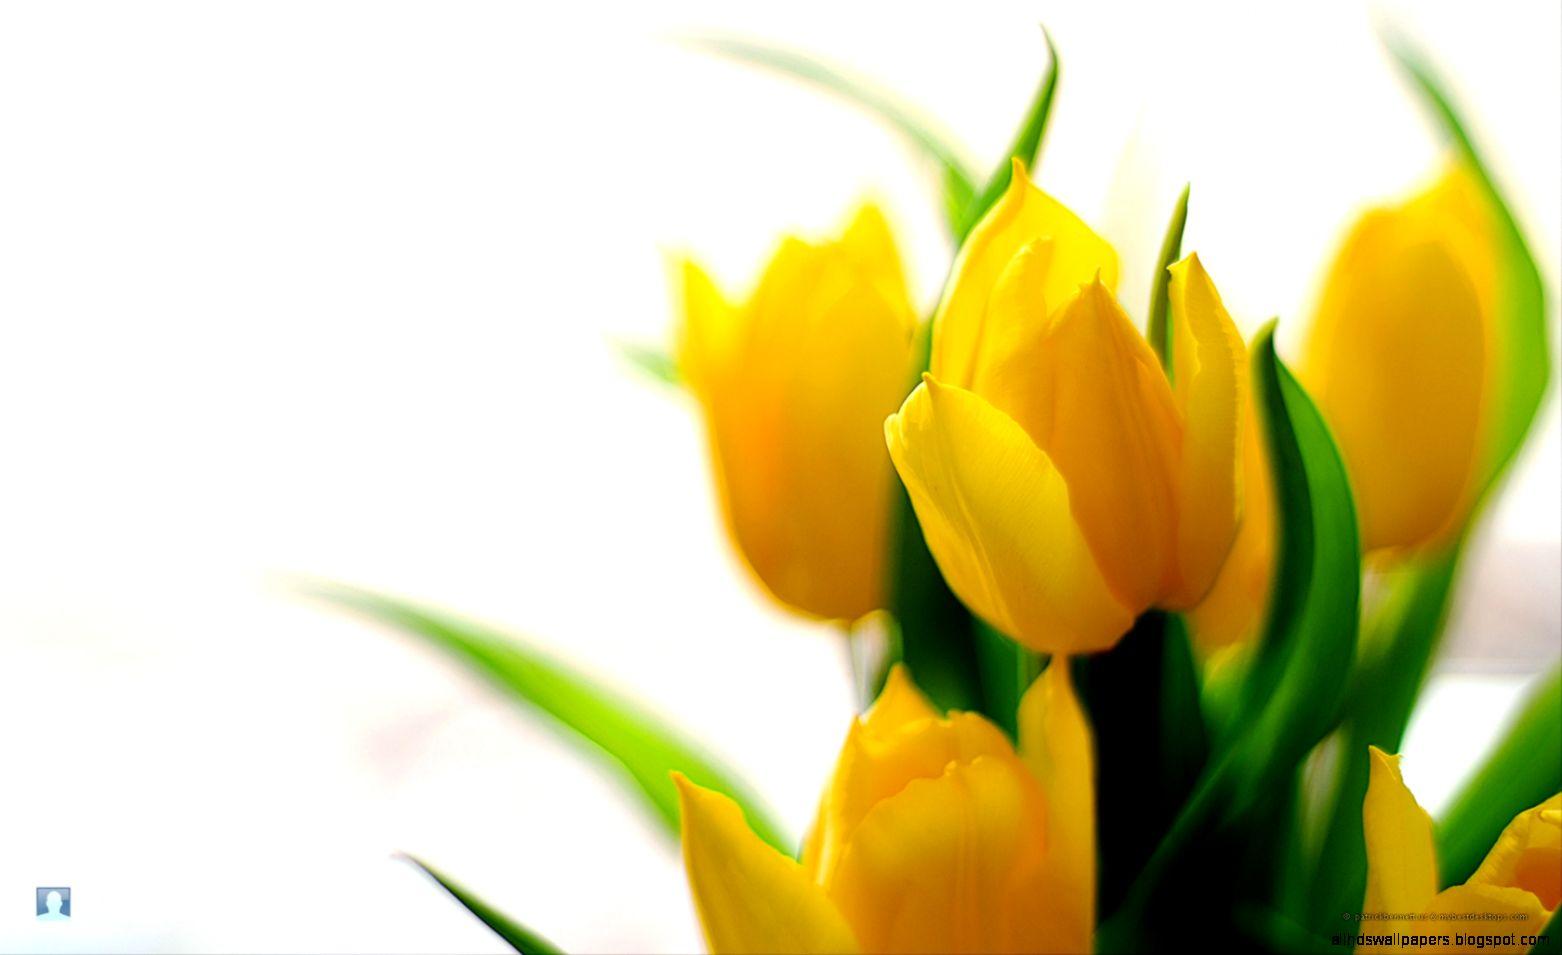 Free Flower Desktop Wallpaper Spring Flowers photos of Free Flower